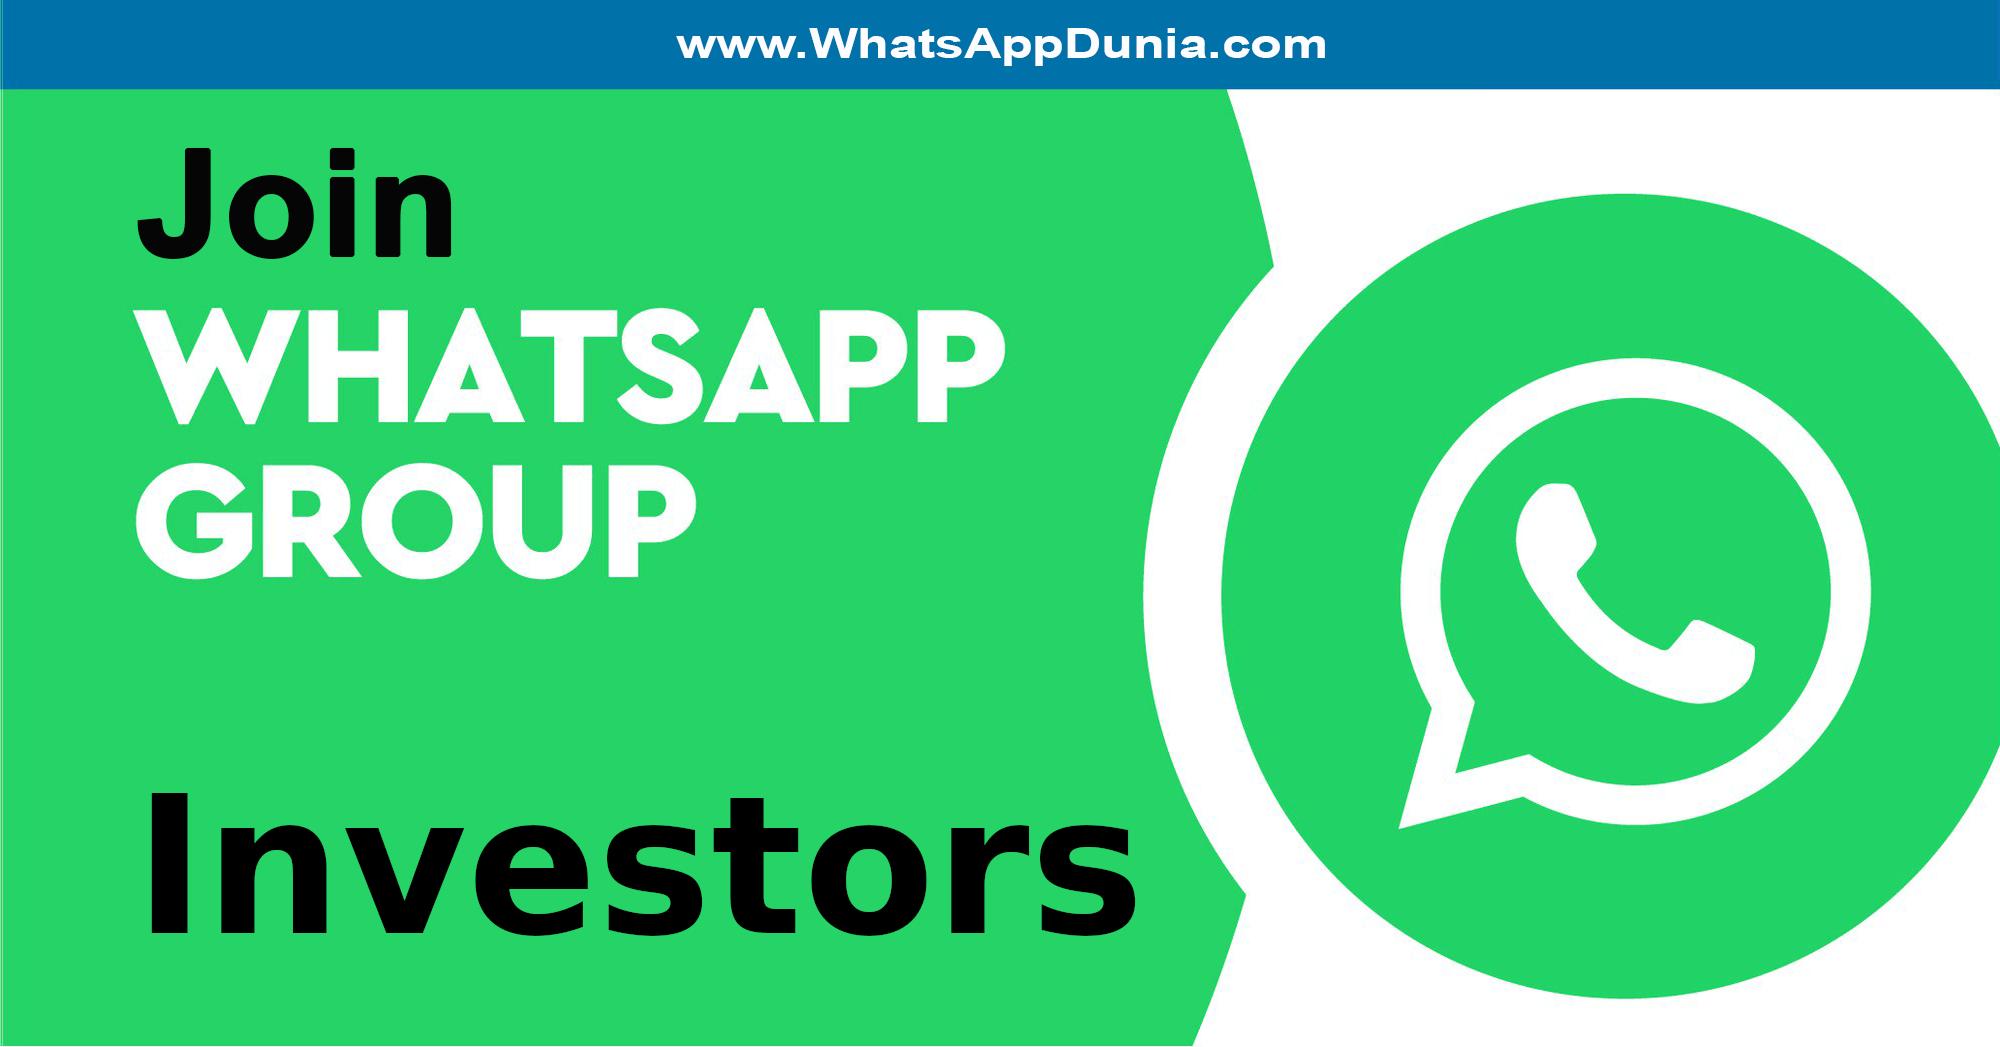 Investors WhatsApp Group Links